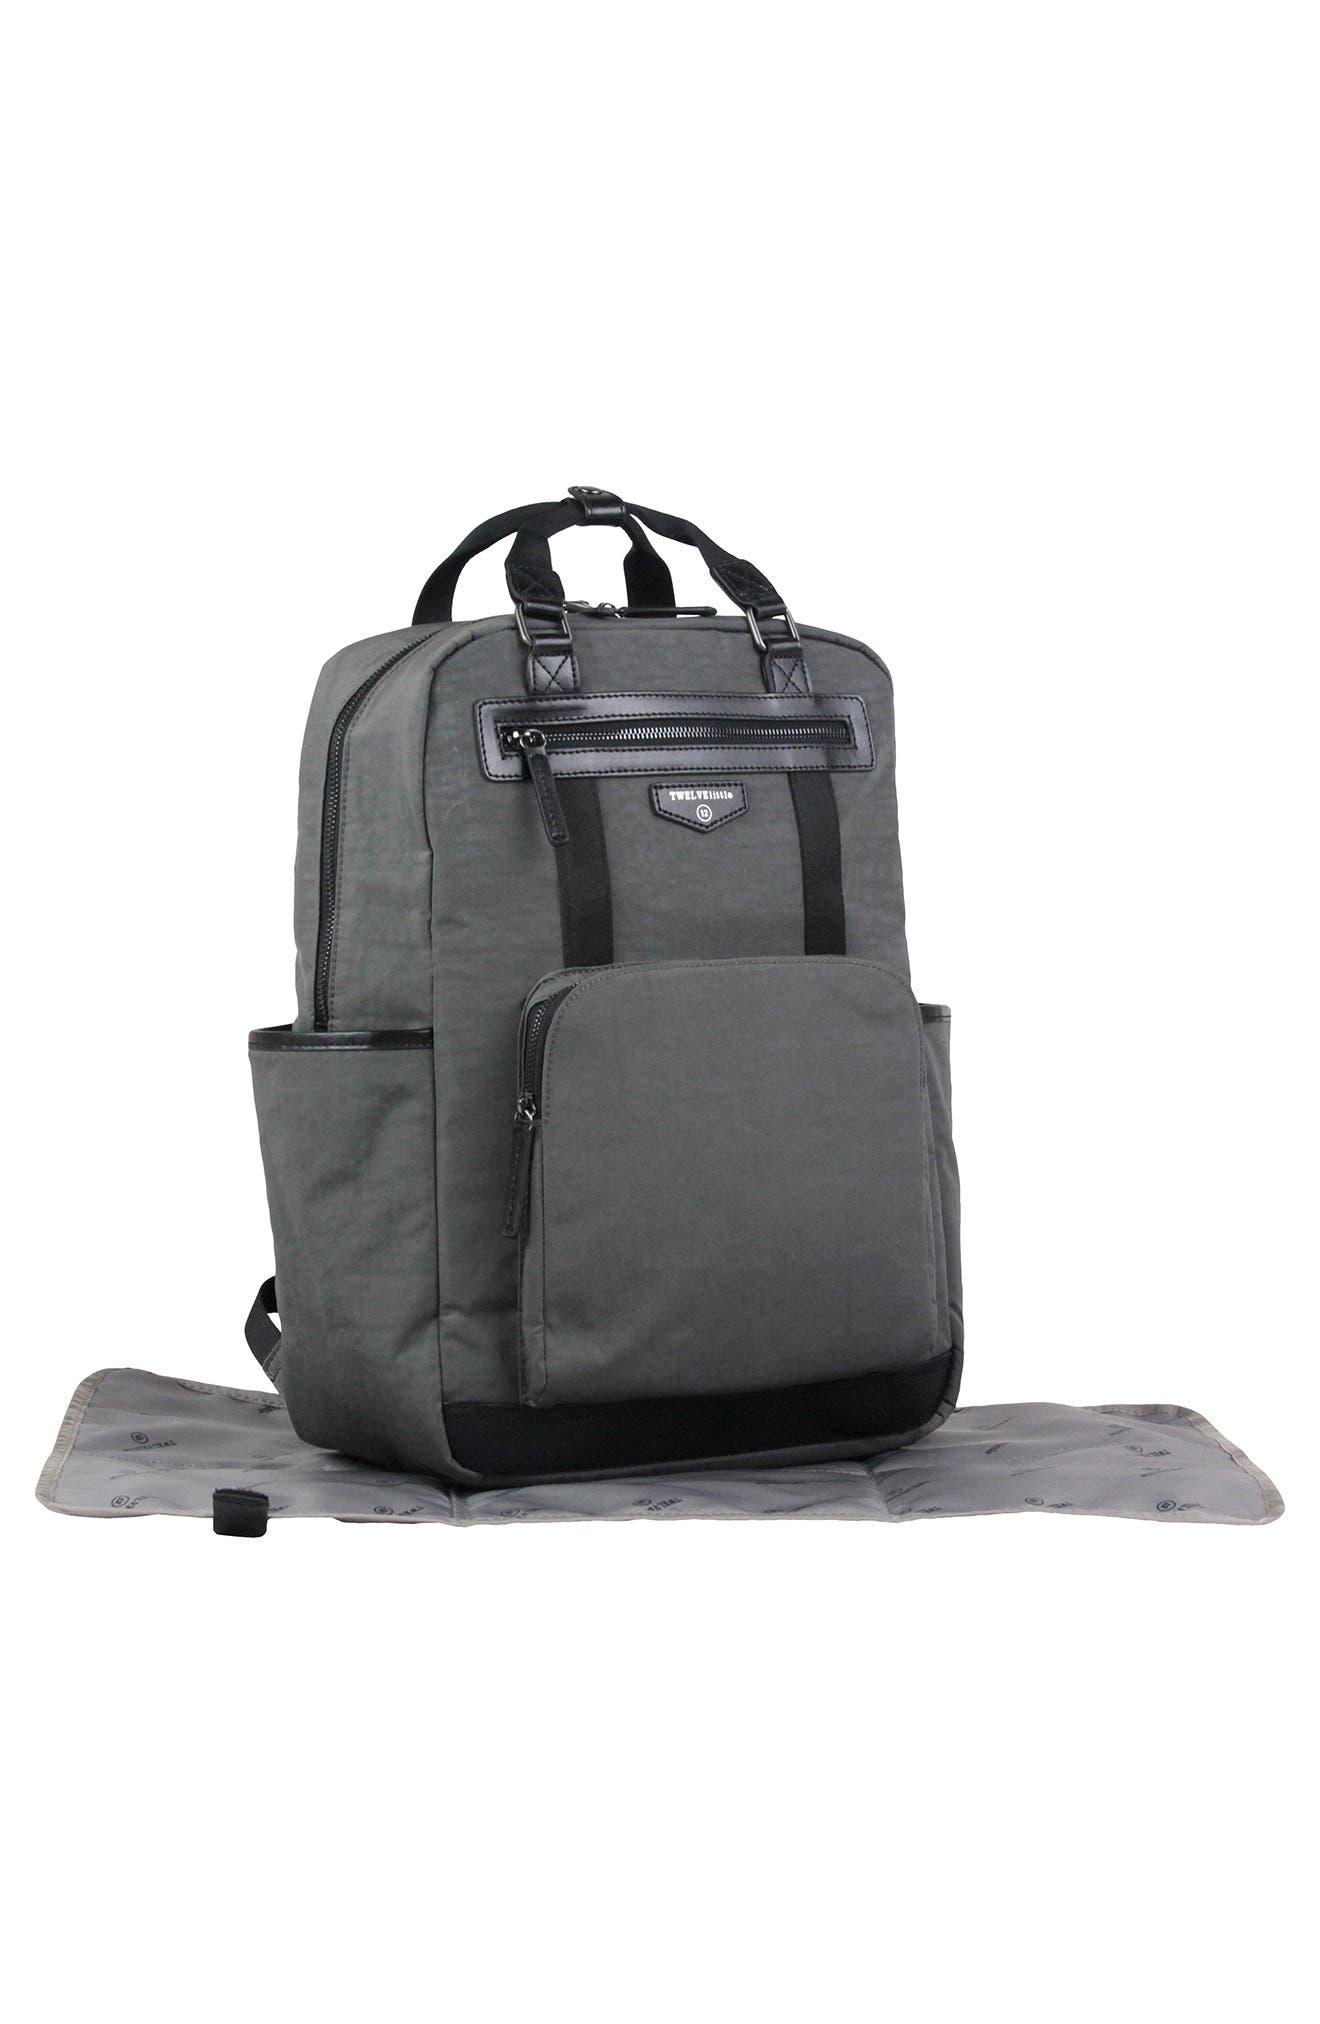 'Courage' Unisex Backpack Diaper Bag,                             Alternate thumbnail 4, color,                             DARK GREY